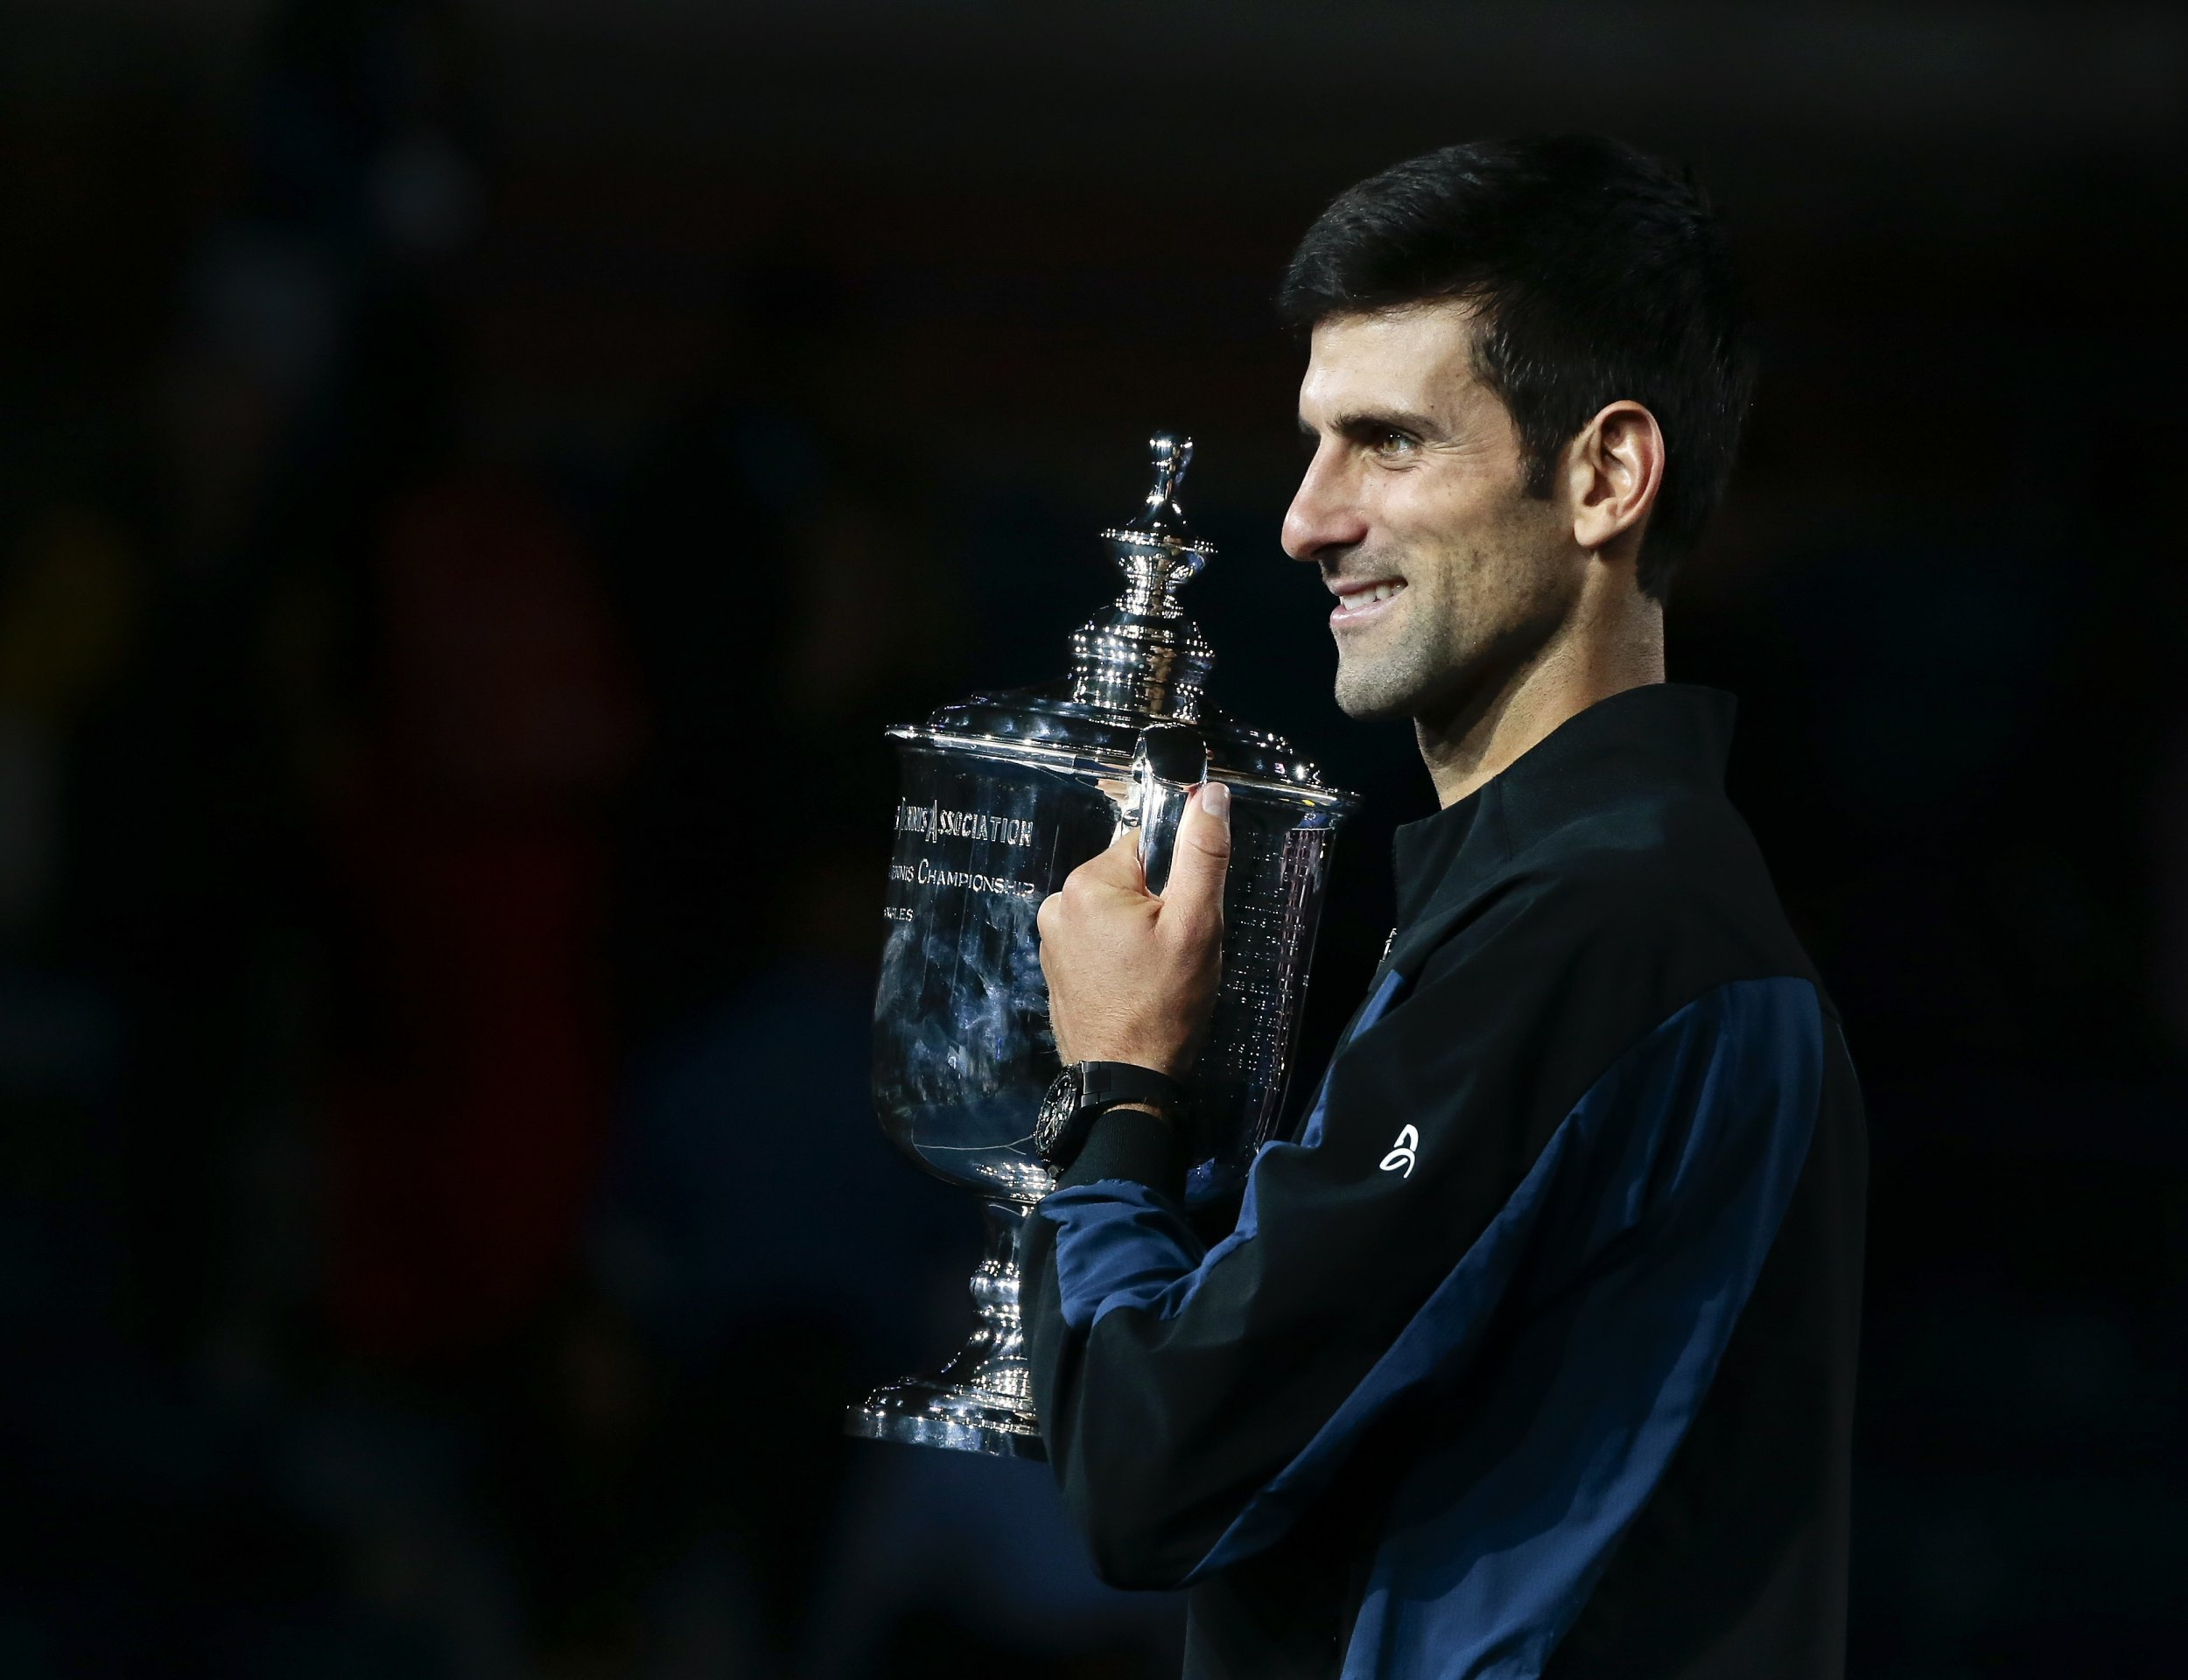 Novak Djokovic is back on top of the tennis world – but can he surpass Rafael Nadal & Roger Federer?